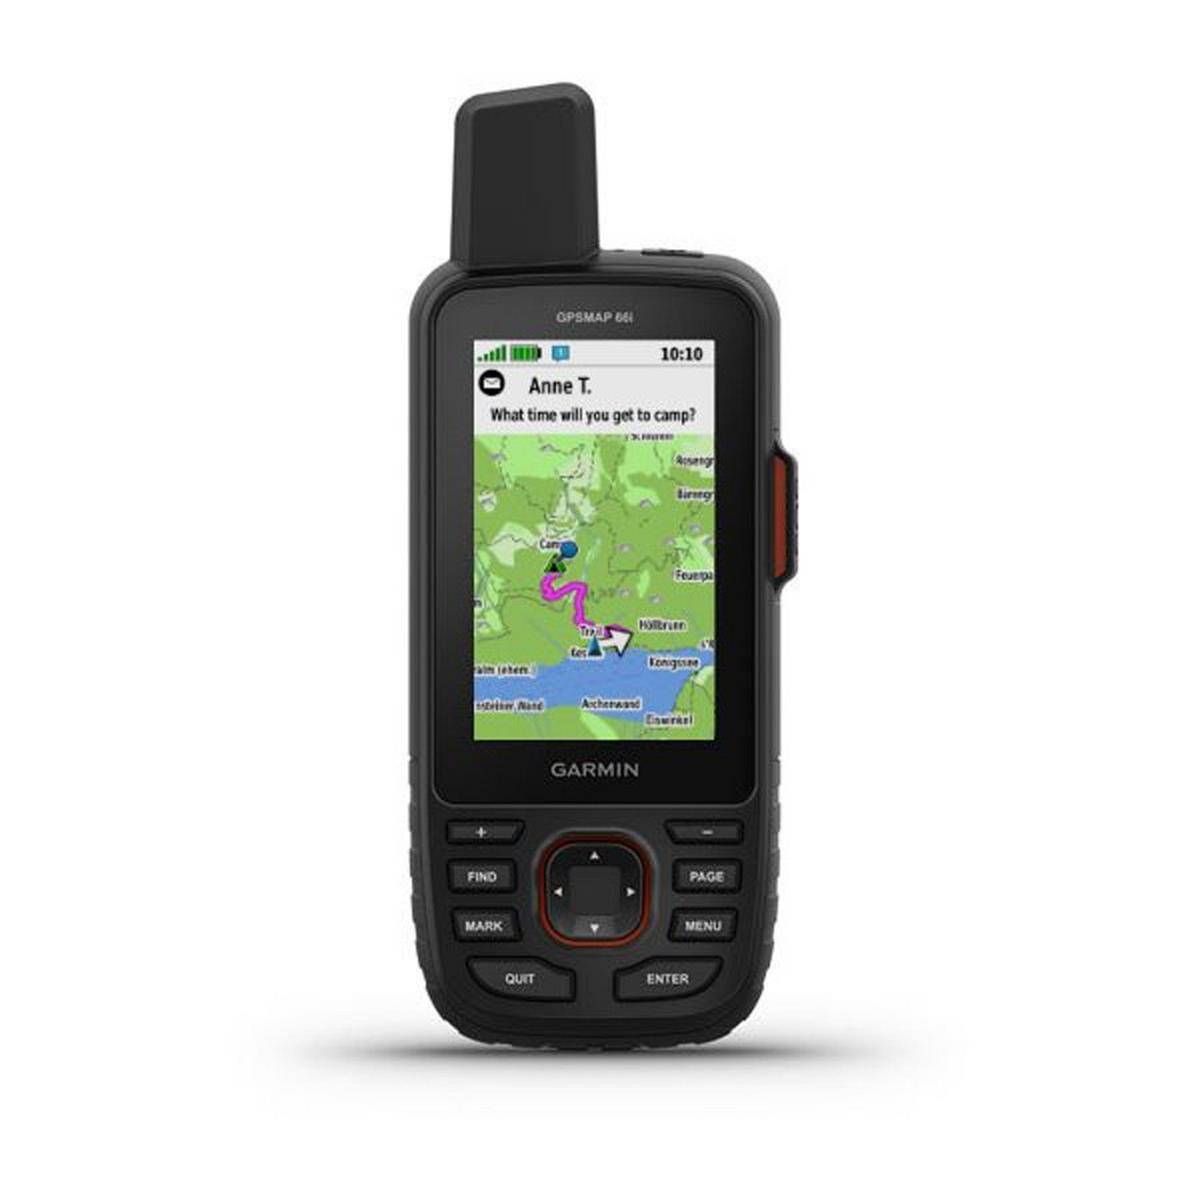 Garmin GPS MAP 66i (unit + TopoActive Europe mapping)